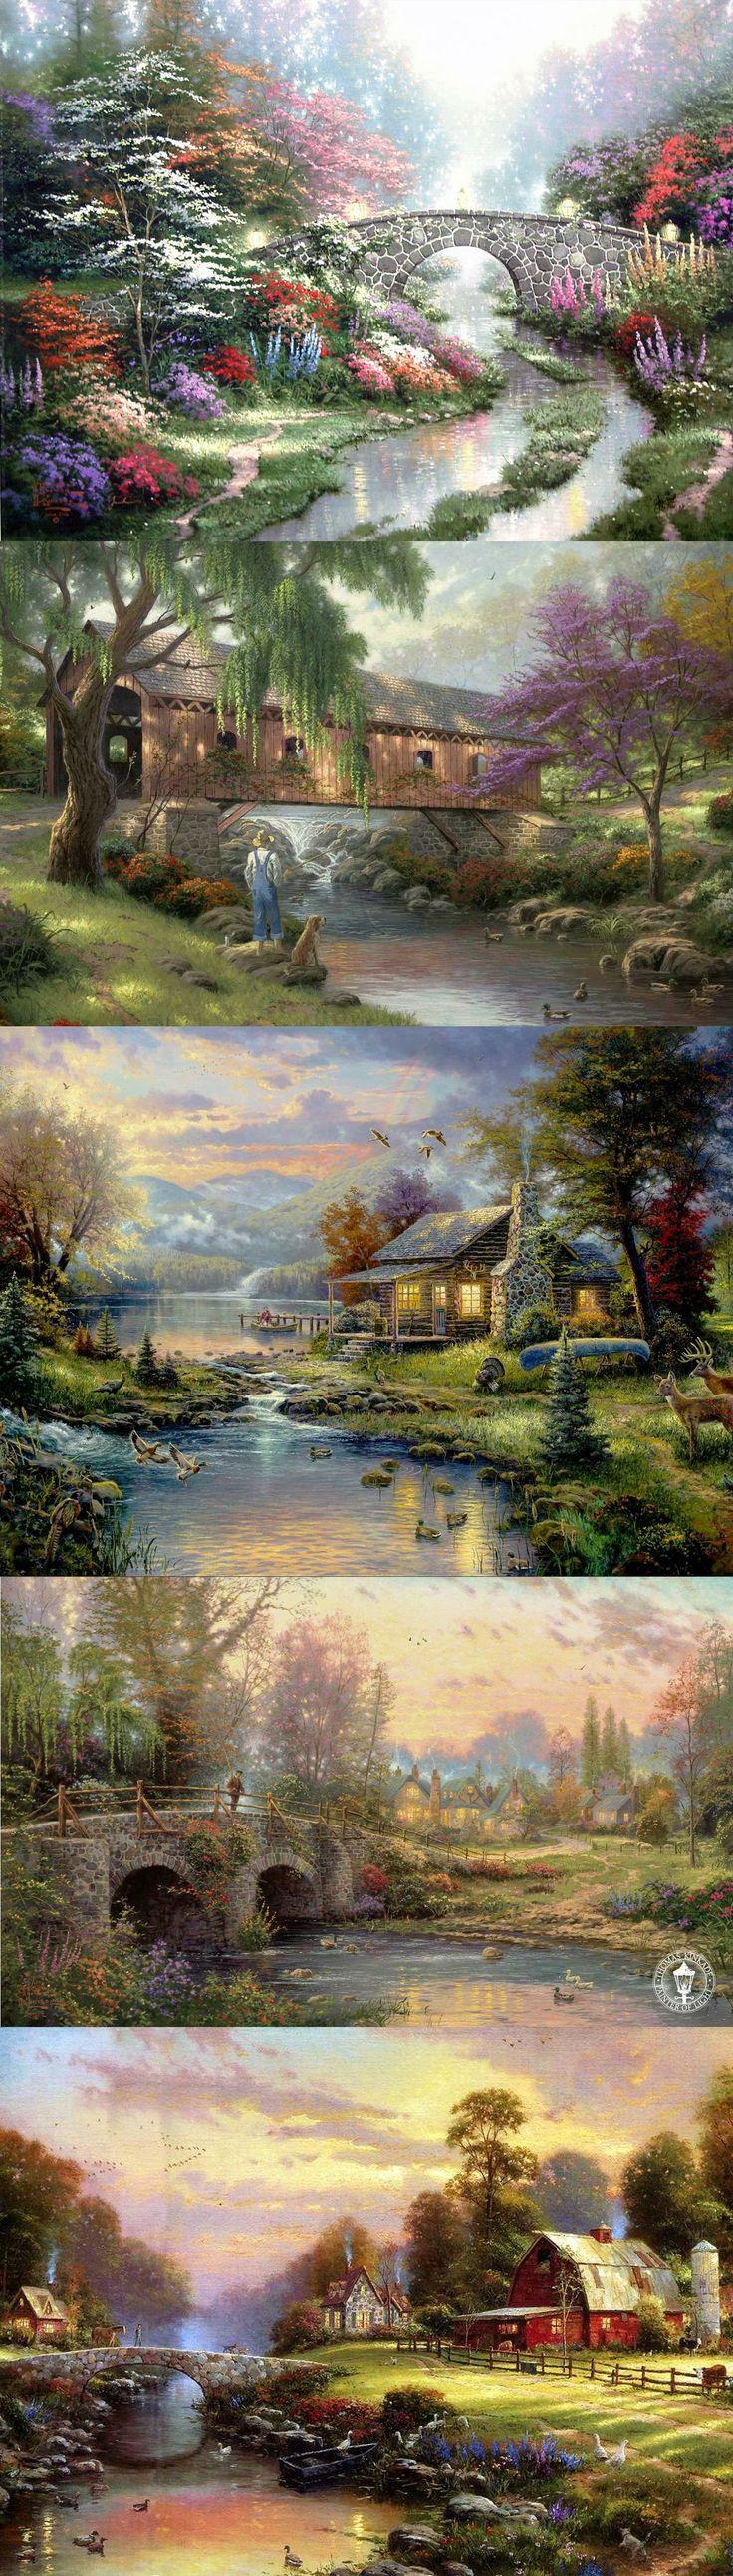 Thomas Kinkade, Natures paradise